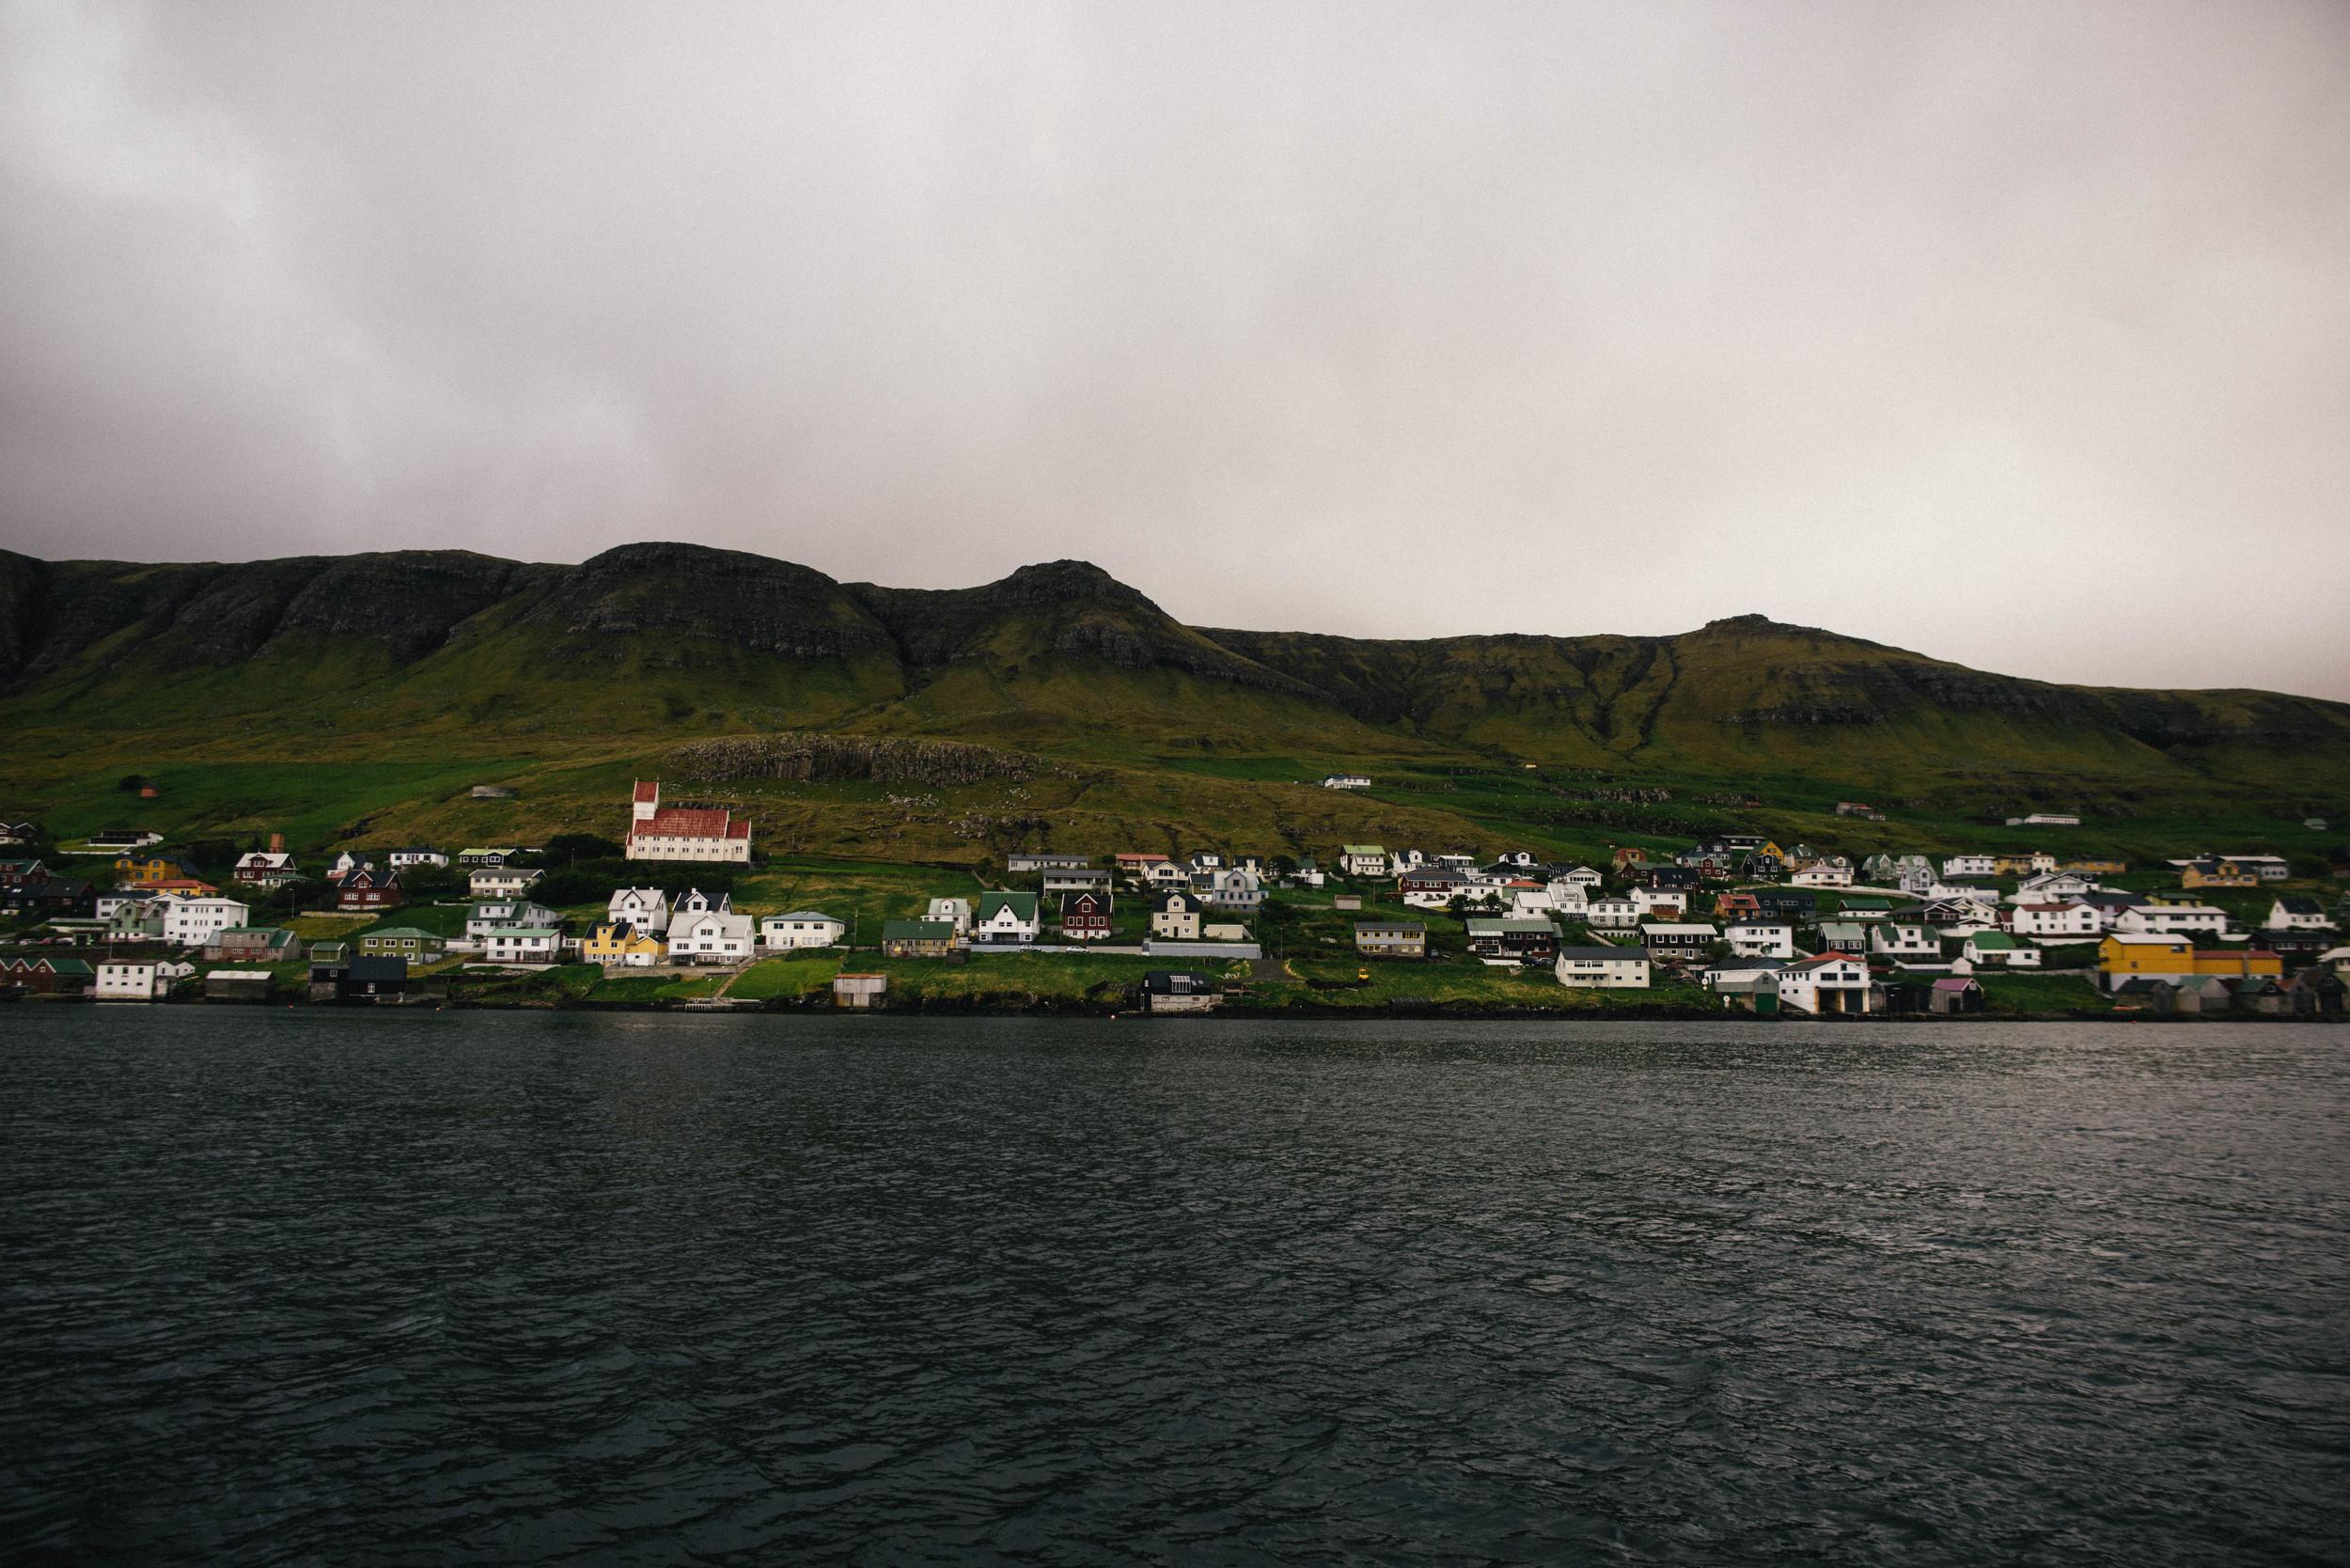 Faroes_Troyoroi-6613.jpg